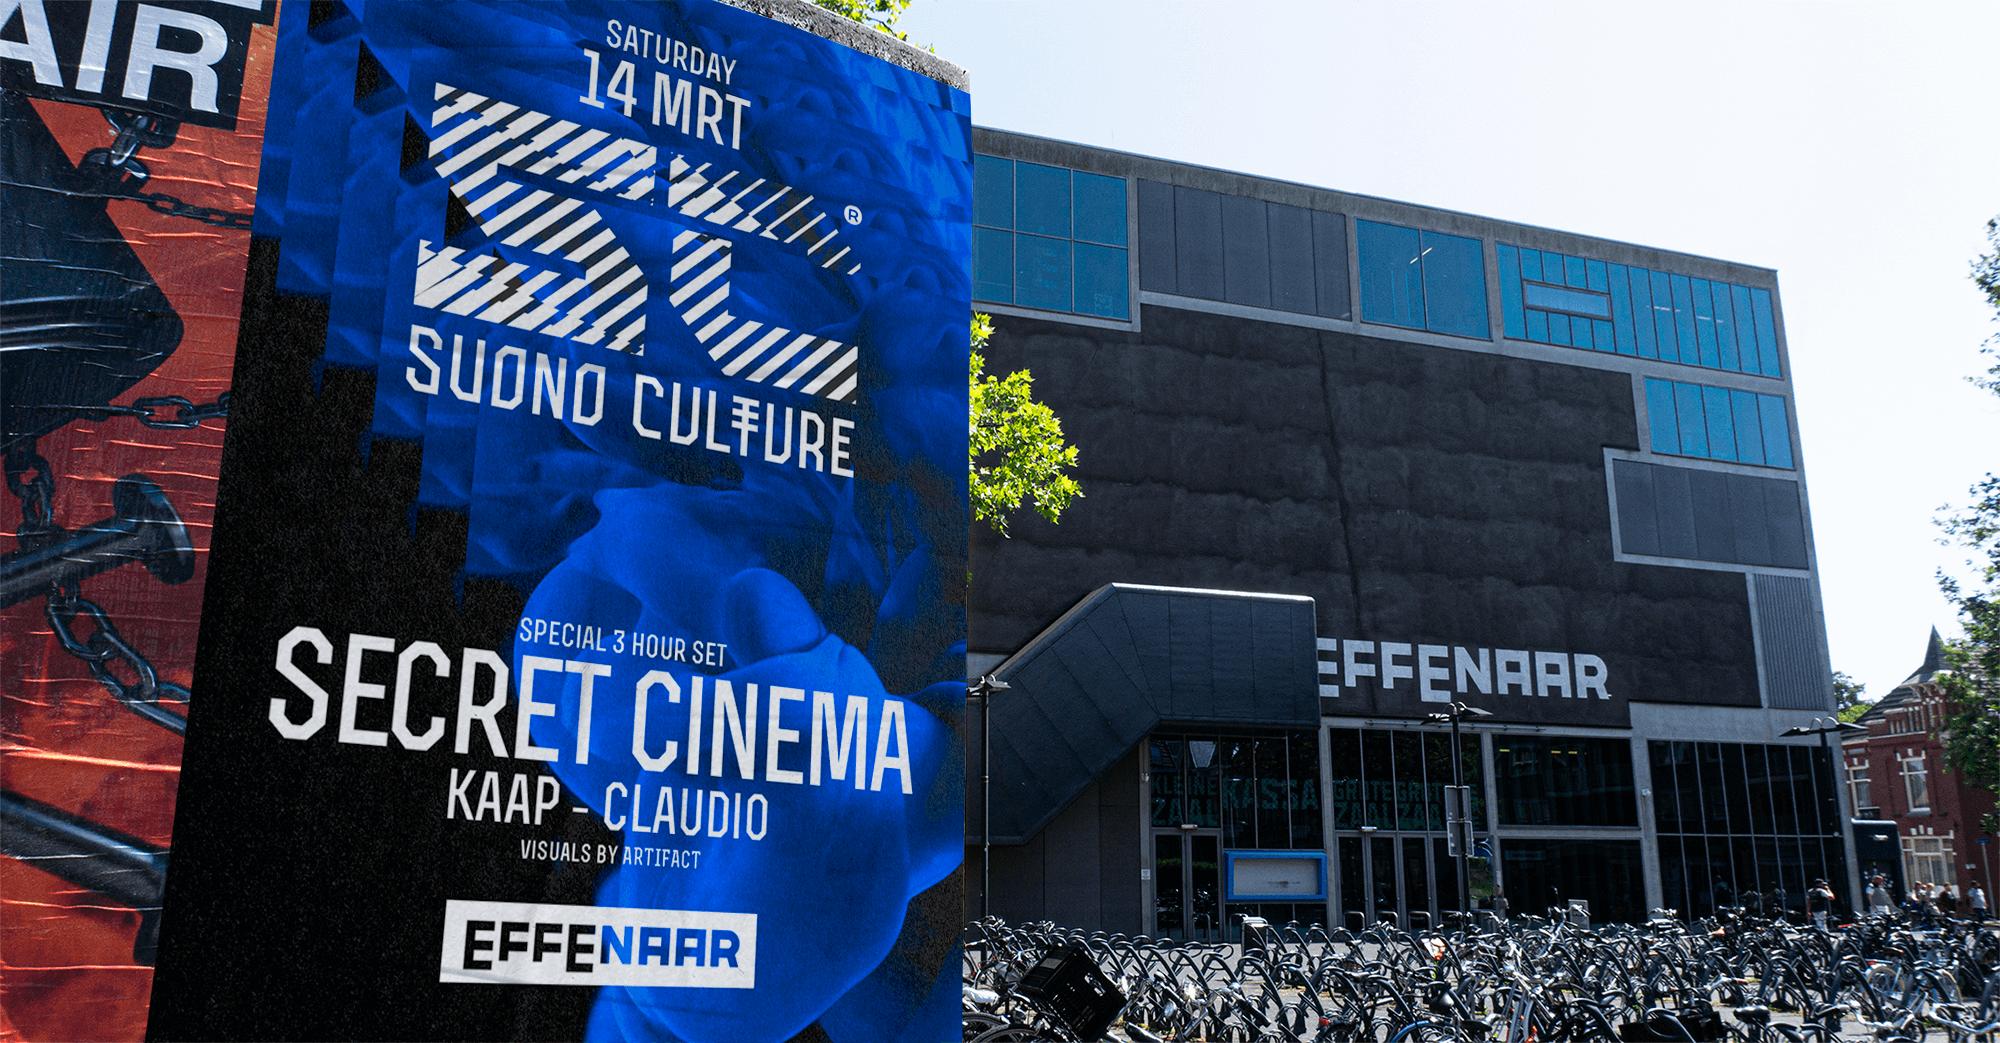 Suono-Culture-Secret-Cinema-2